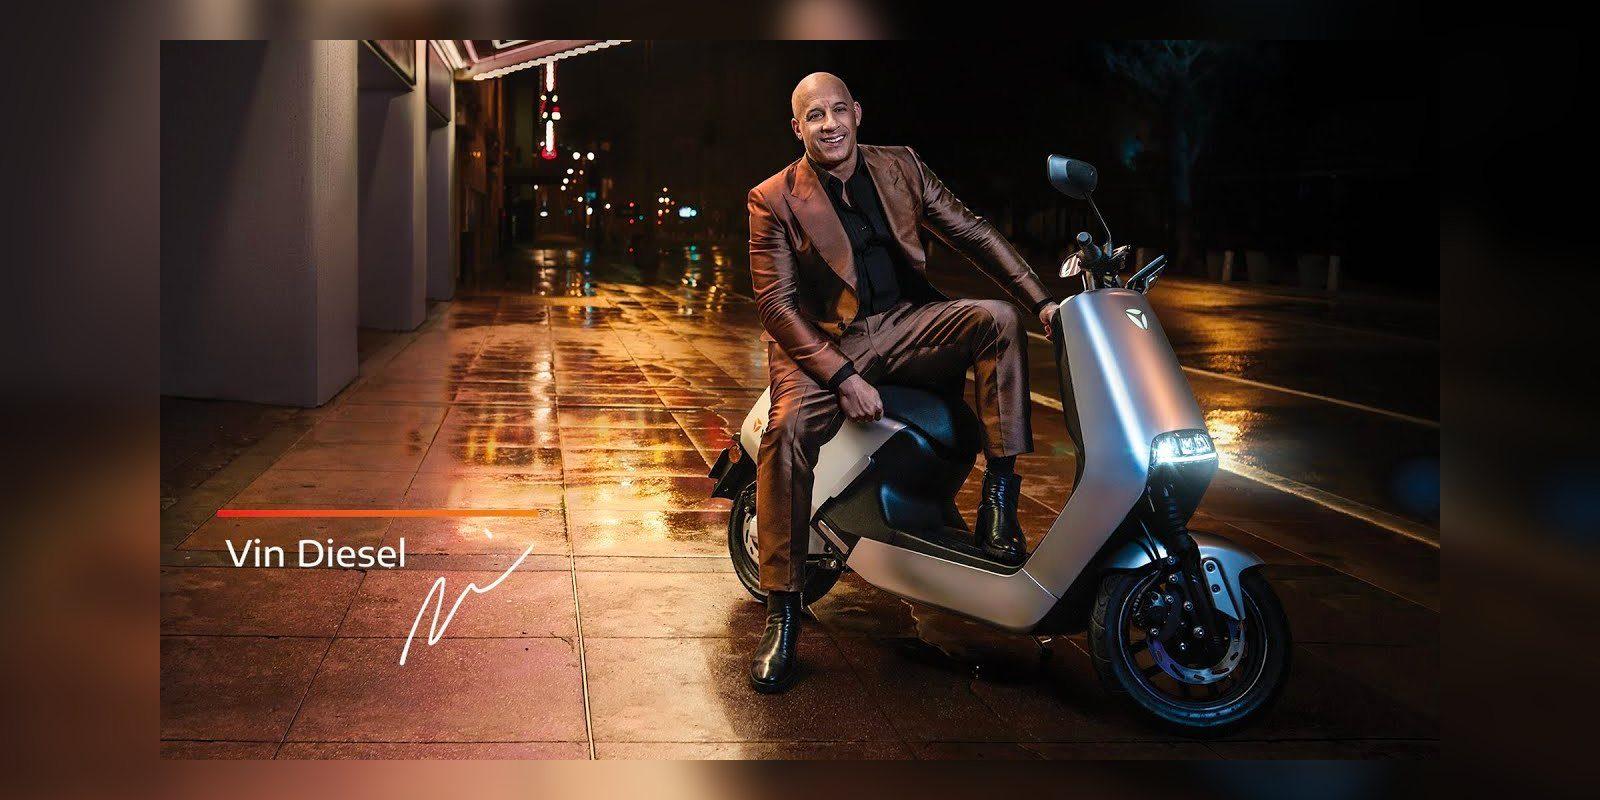 Vin Diesel, acelera elétrica Yadea G5